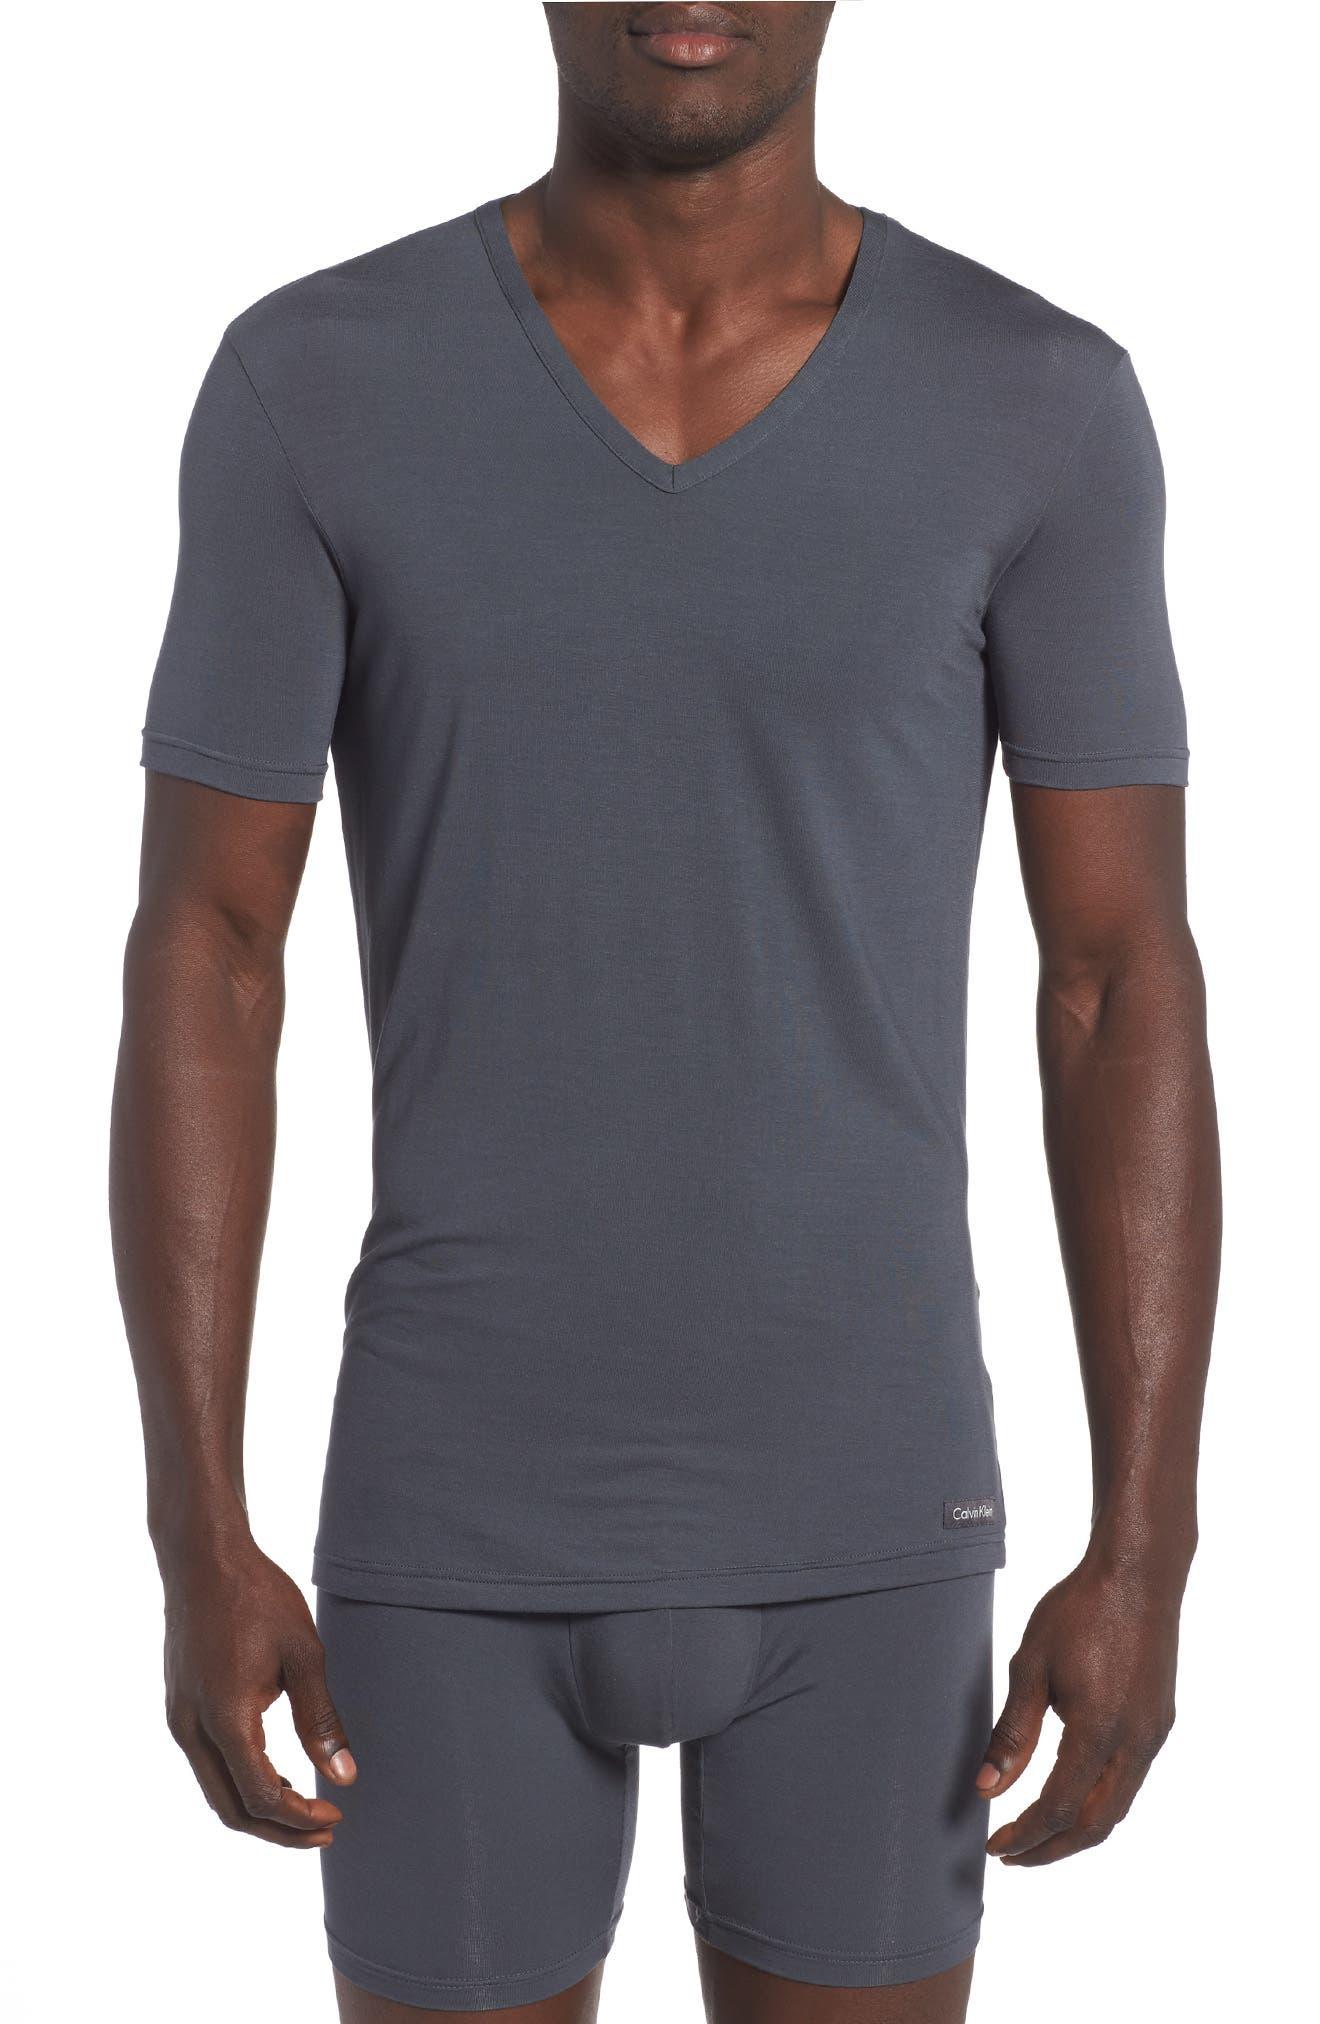 'U5563' V-Neck Micromodal T-Shirt,                             Main thumbnail 1, color,                             MINK